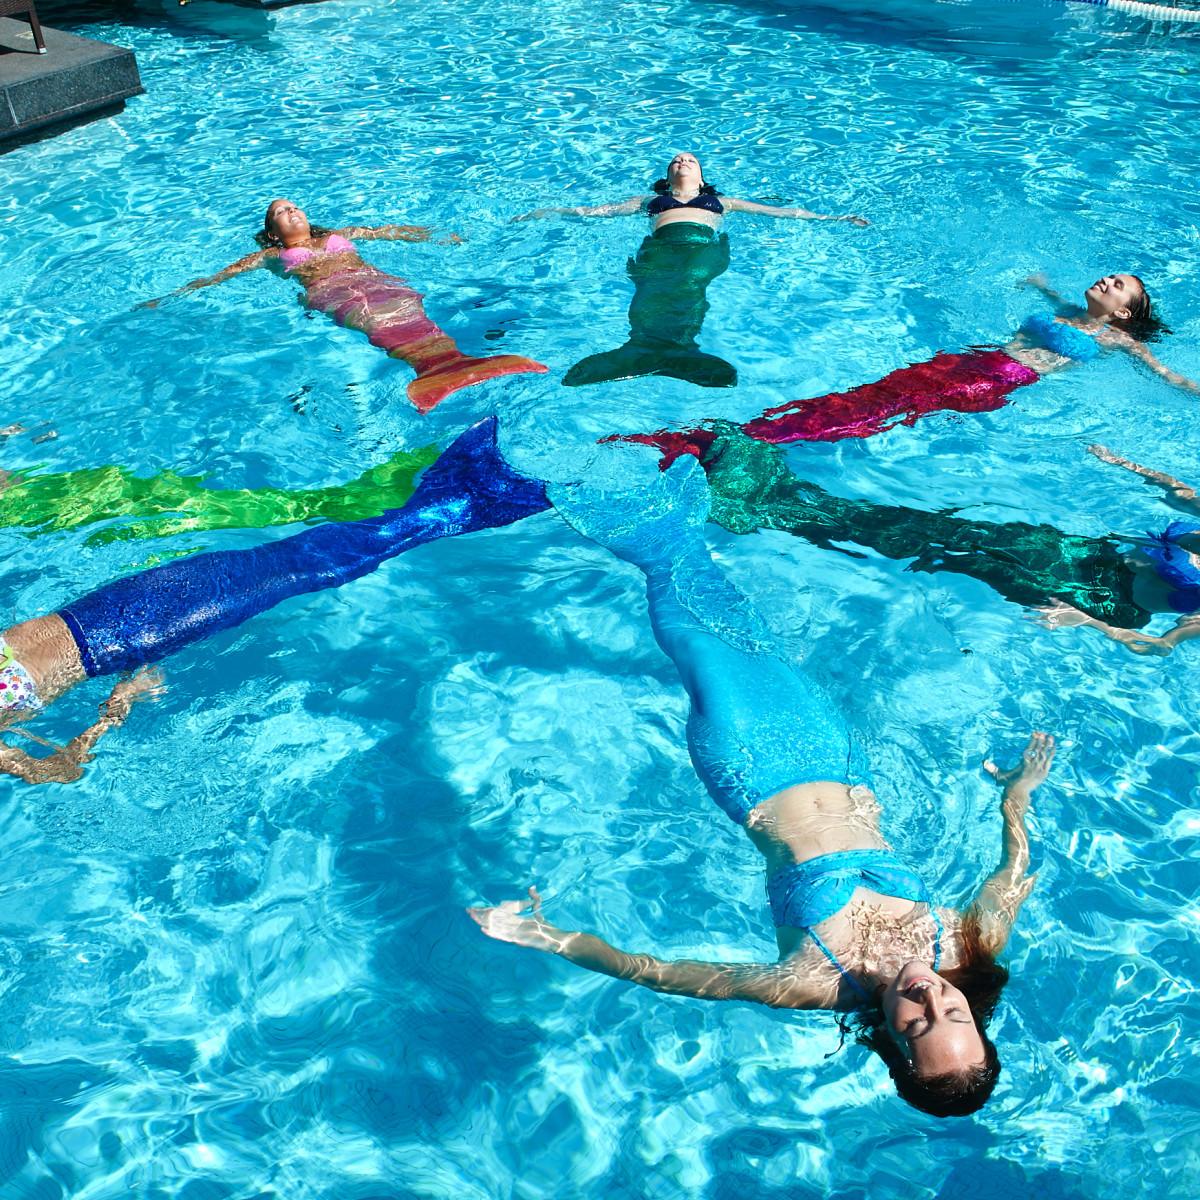 AquaMermaid mermaid swimming